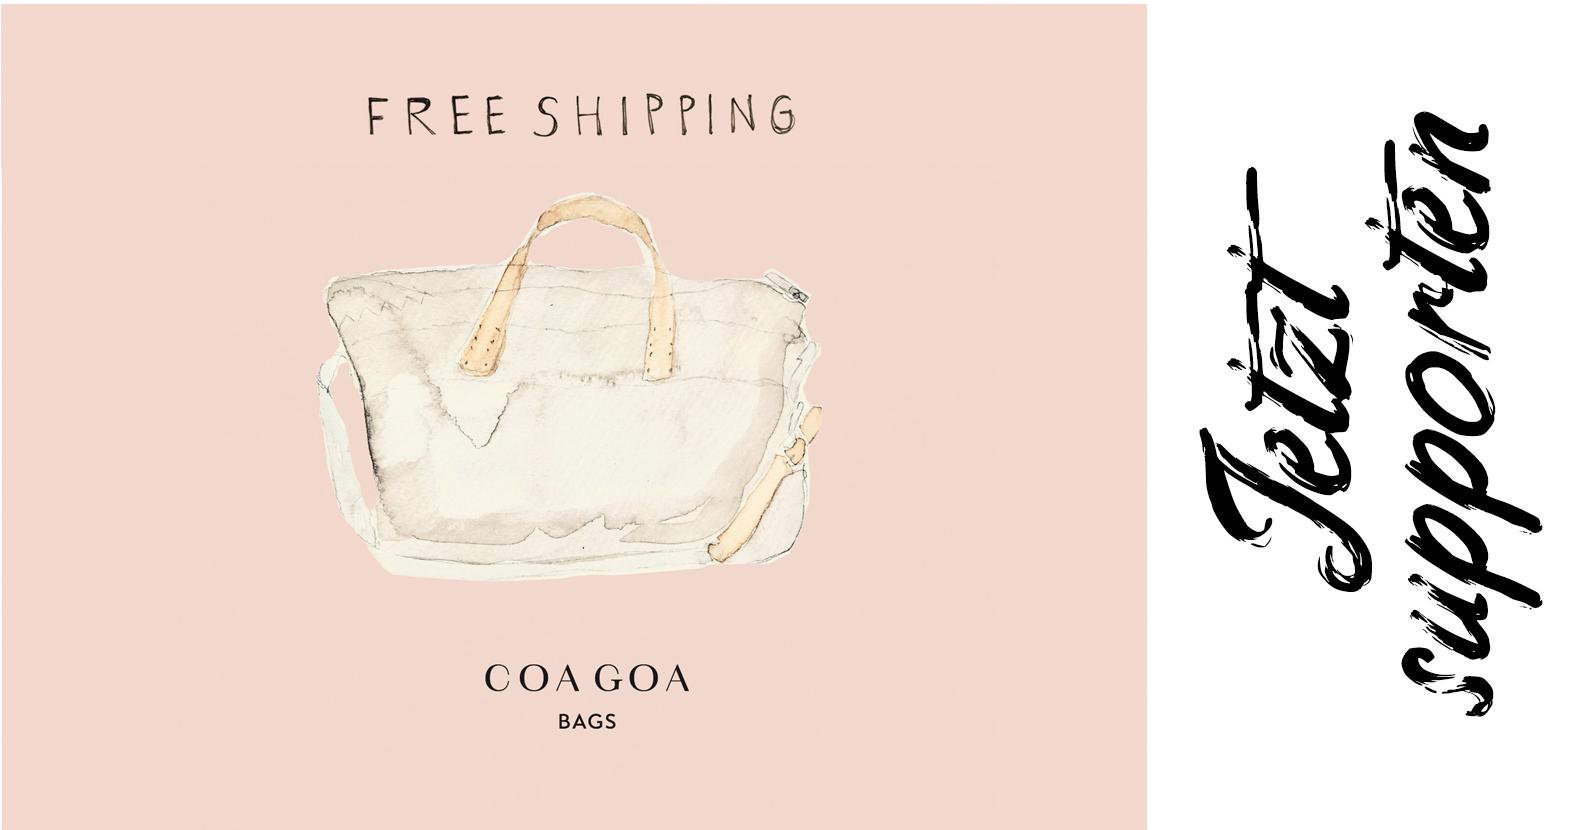 Versandkostenfreie Upcycling-Bags by Coa Coa